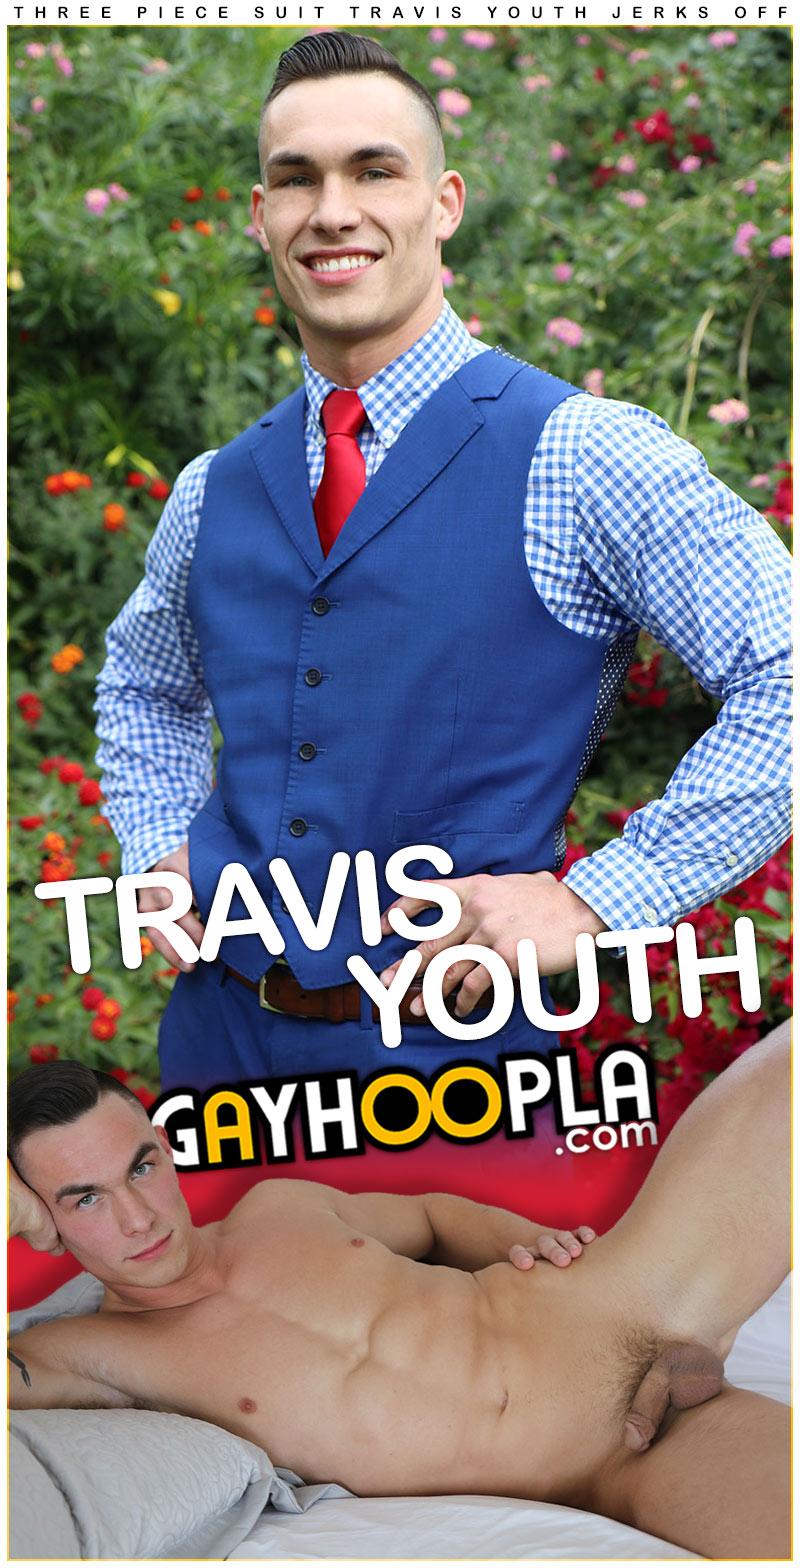 Travis Youth at GayHoopla